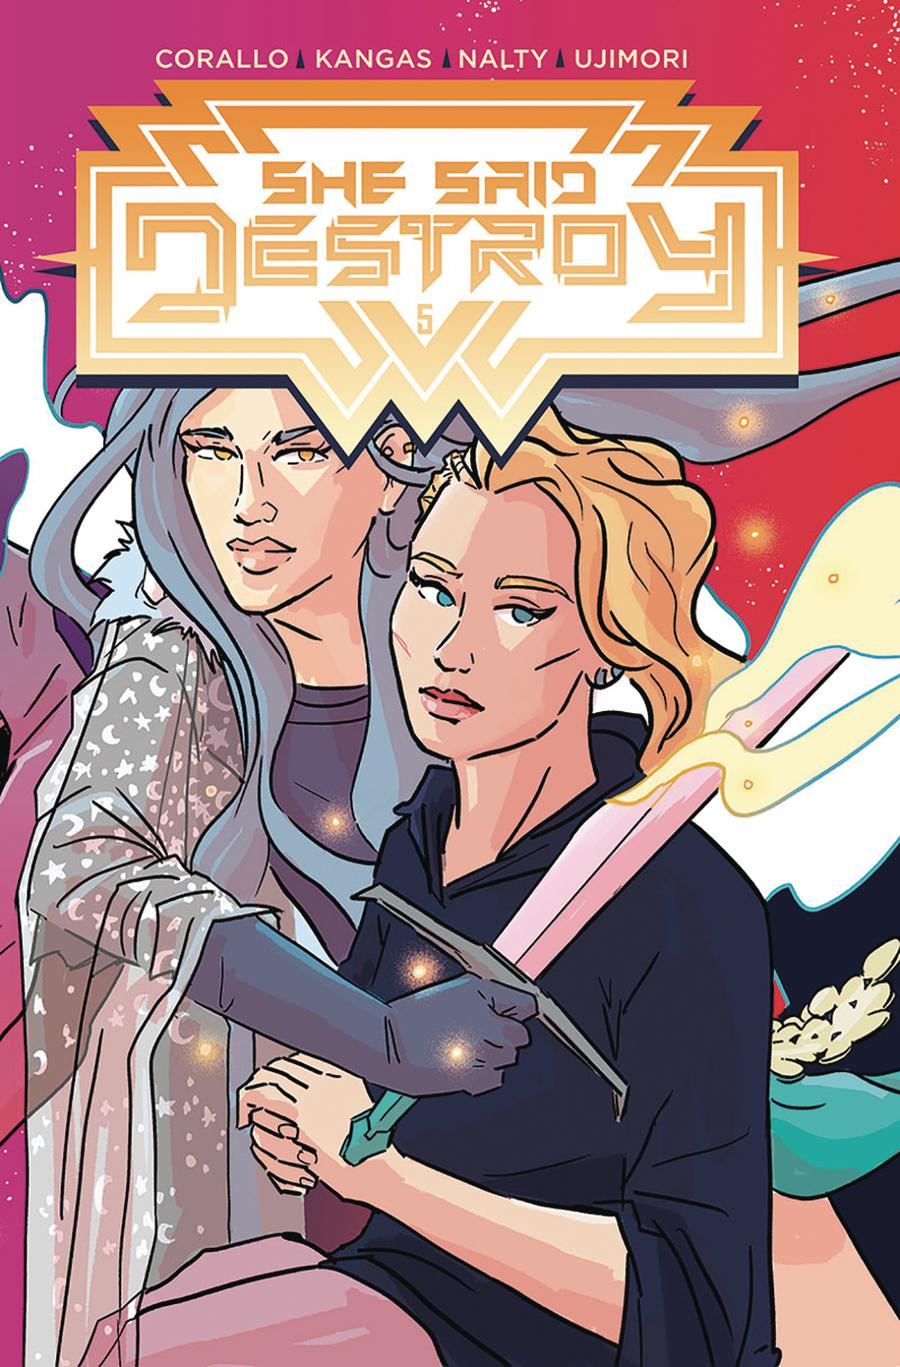 She Said Destroy #5